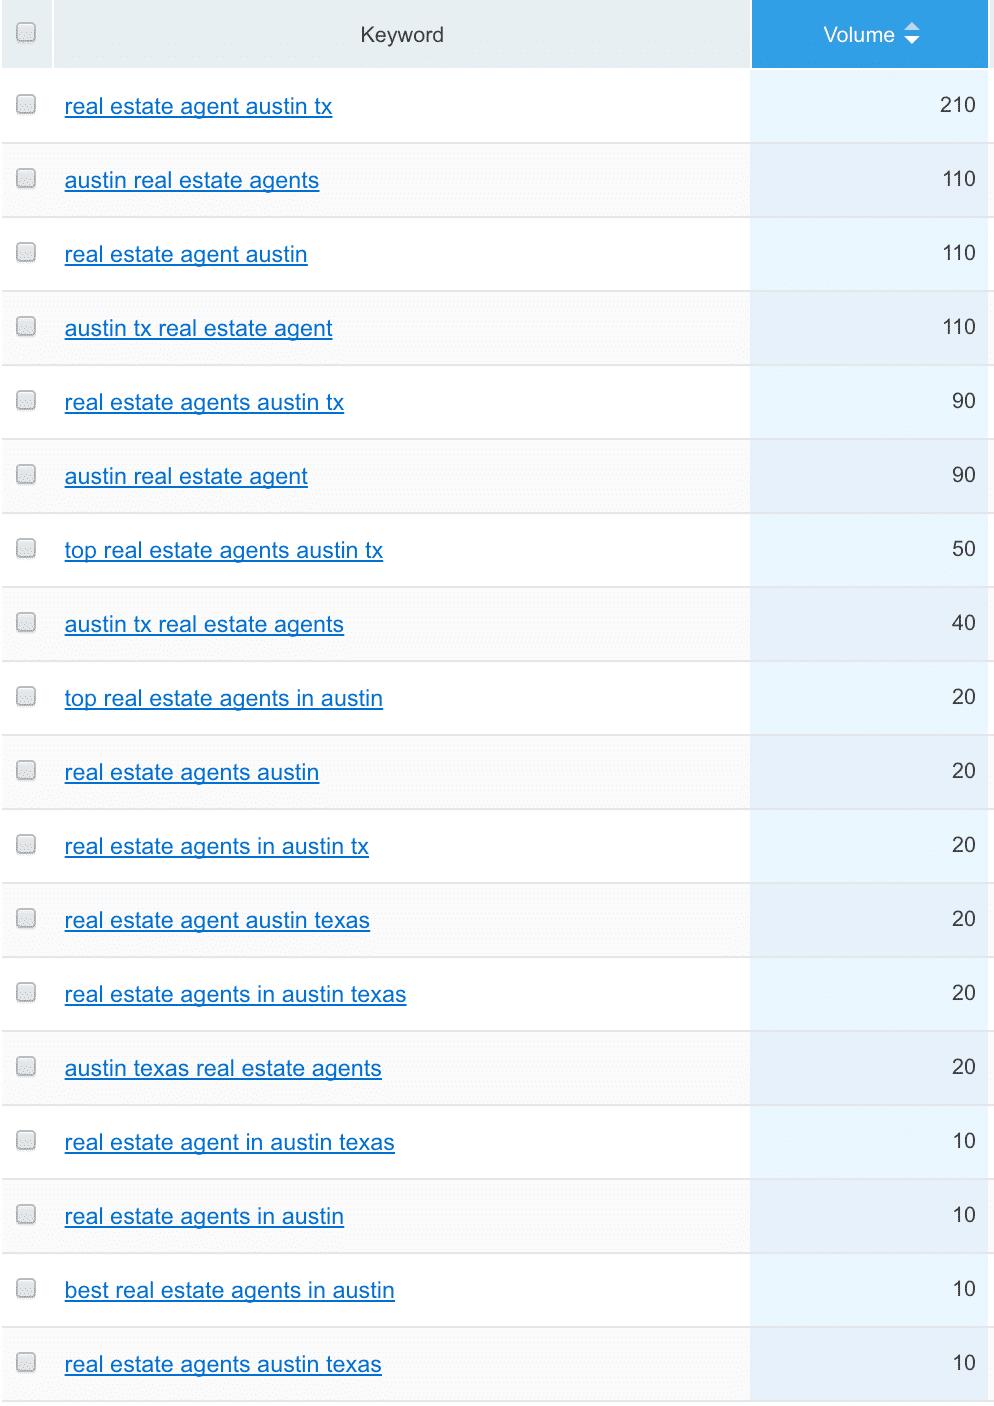 screen shot of keyword tracking tool